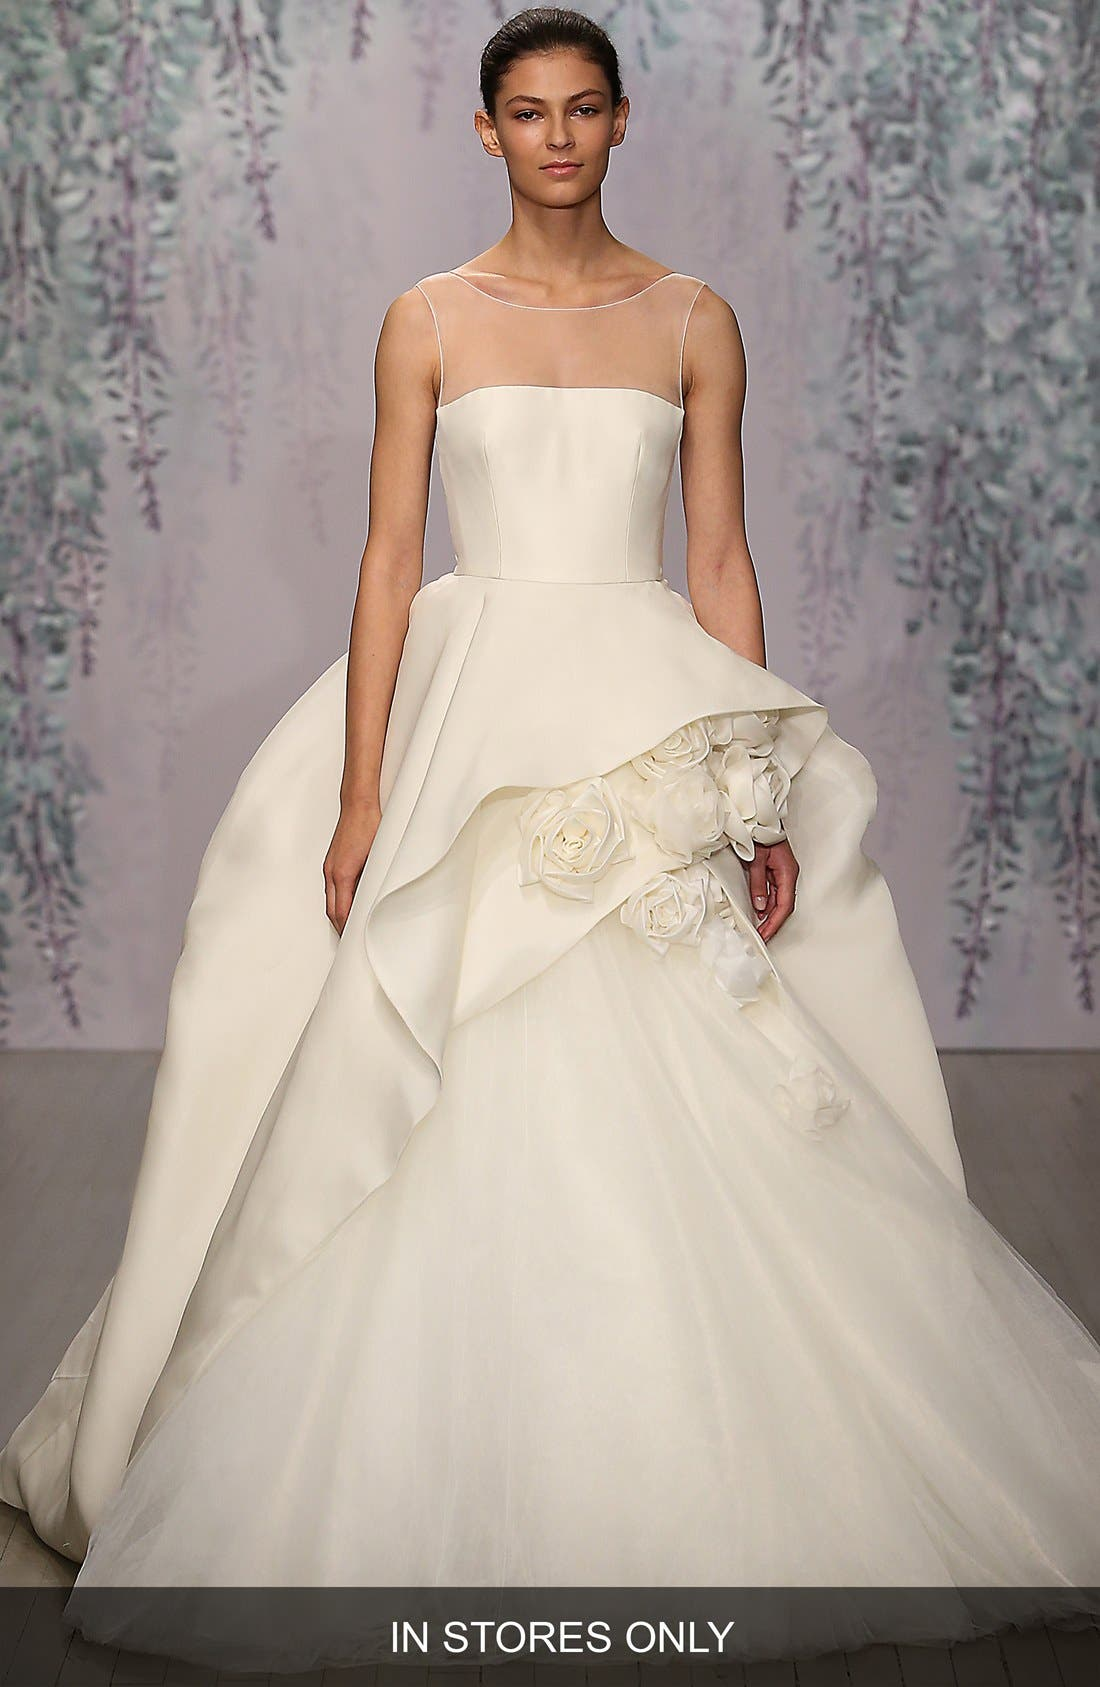 Rosette Detail Silk Ballgown Dress,                             Main thumbnail 1, color,                             IVORY